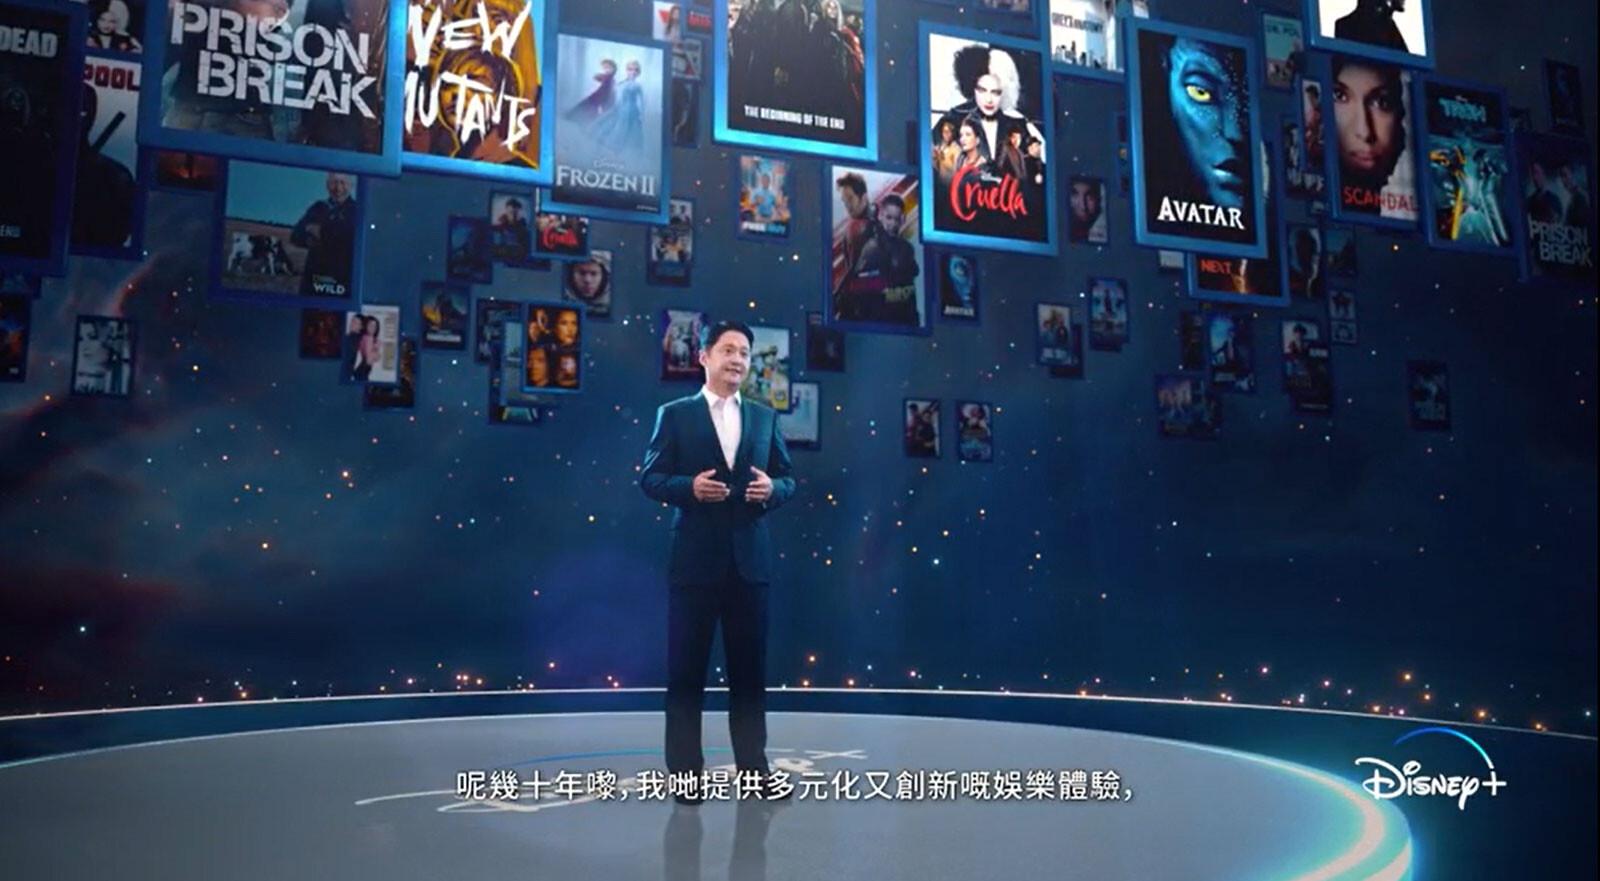 Disney wants some of Netflix's Asian success